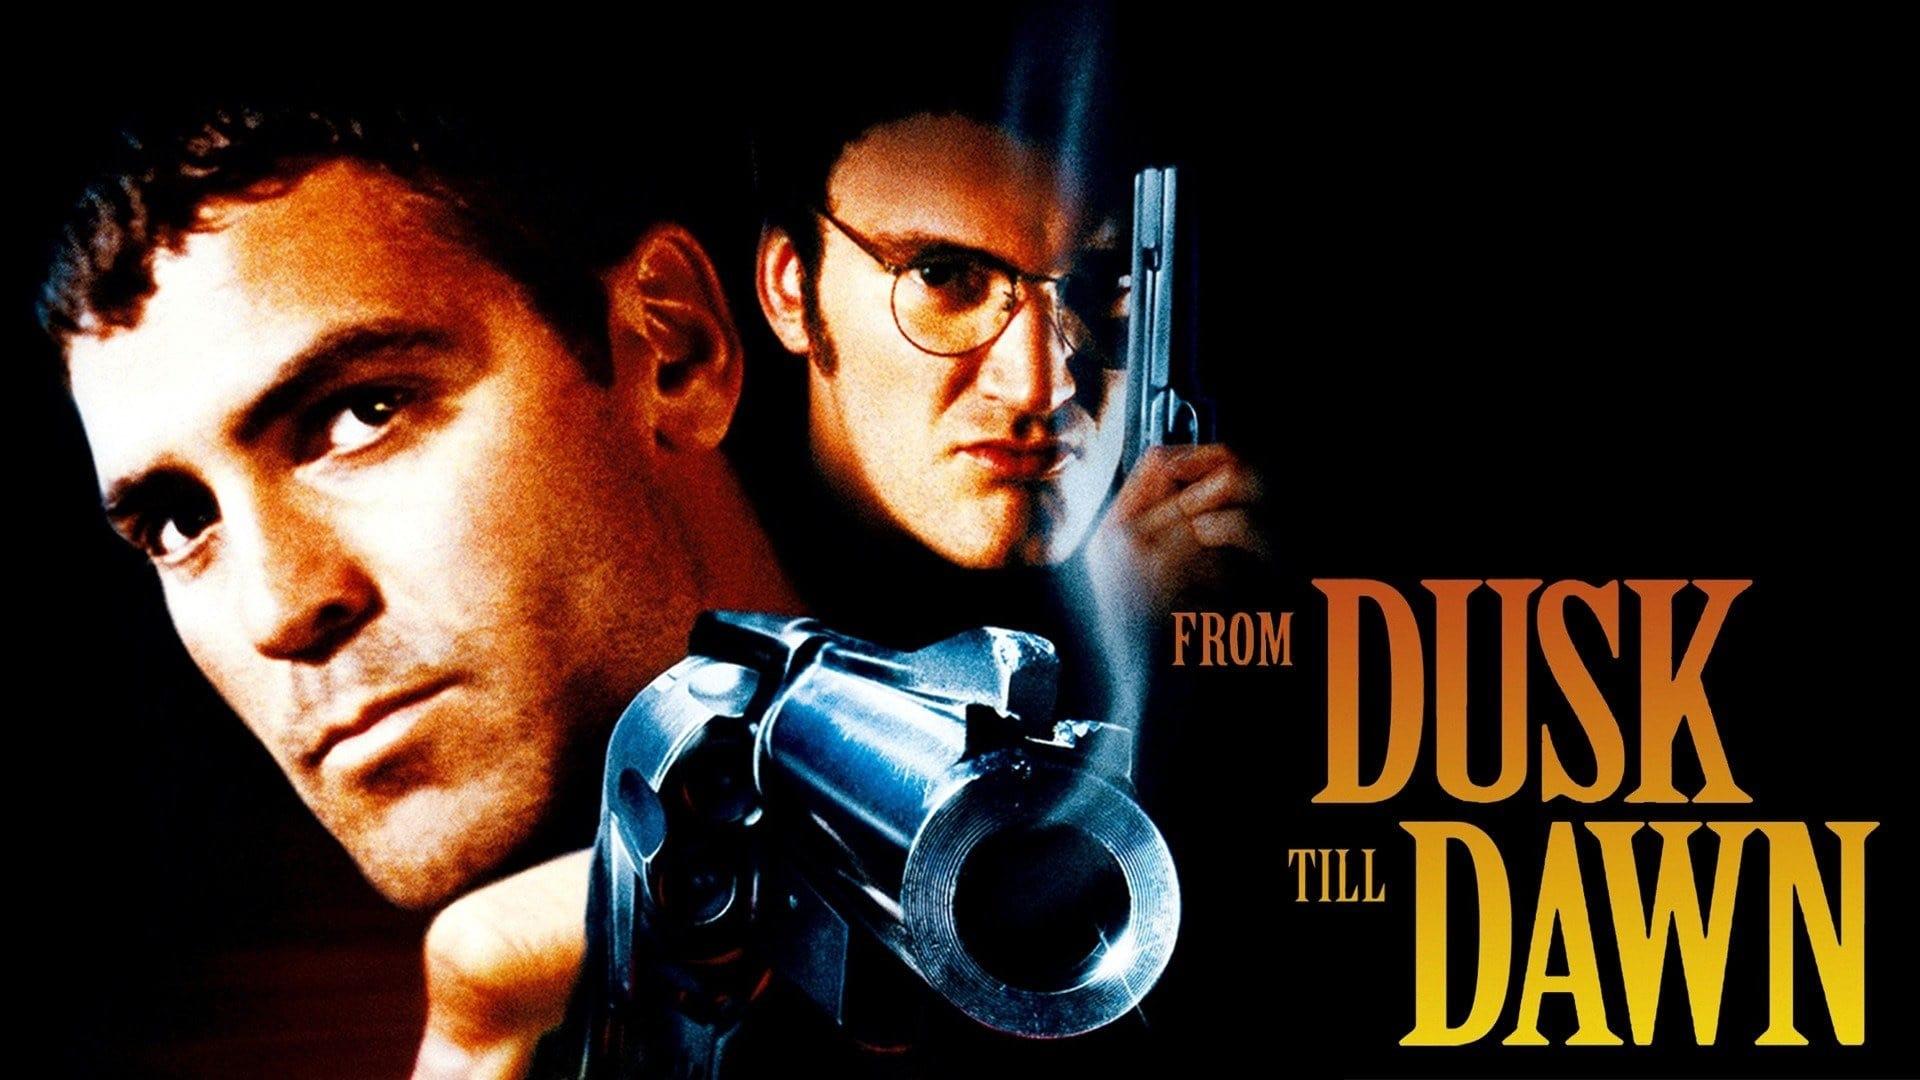 Watch From Dusk Till Dawn (1996) Full Movie Streaming Online